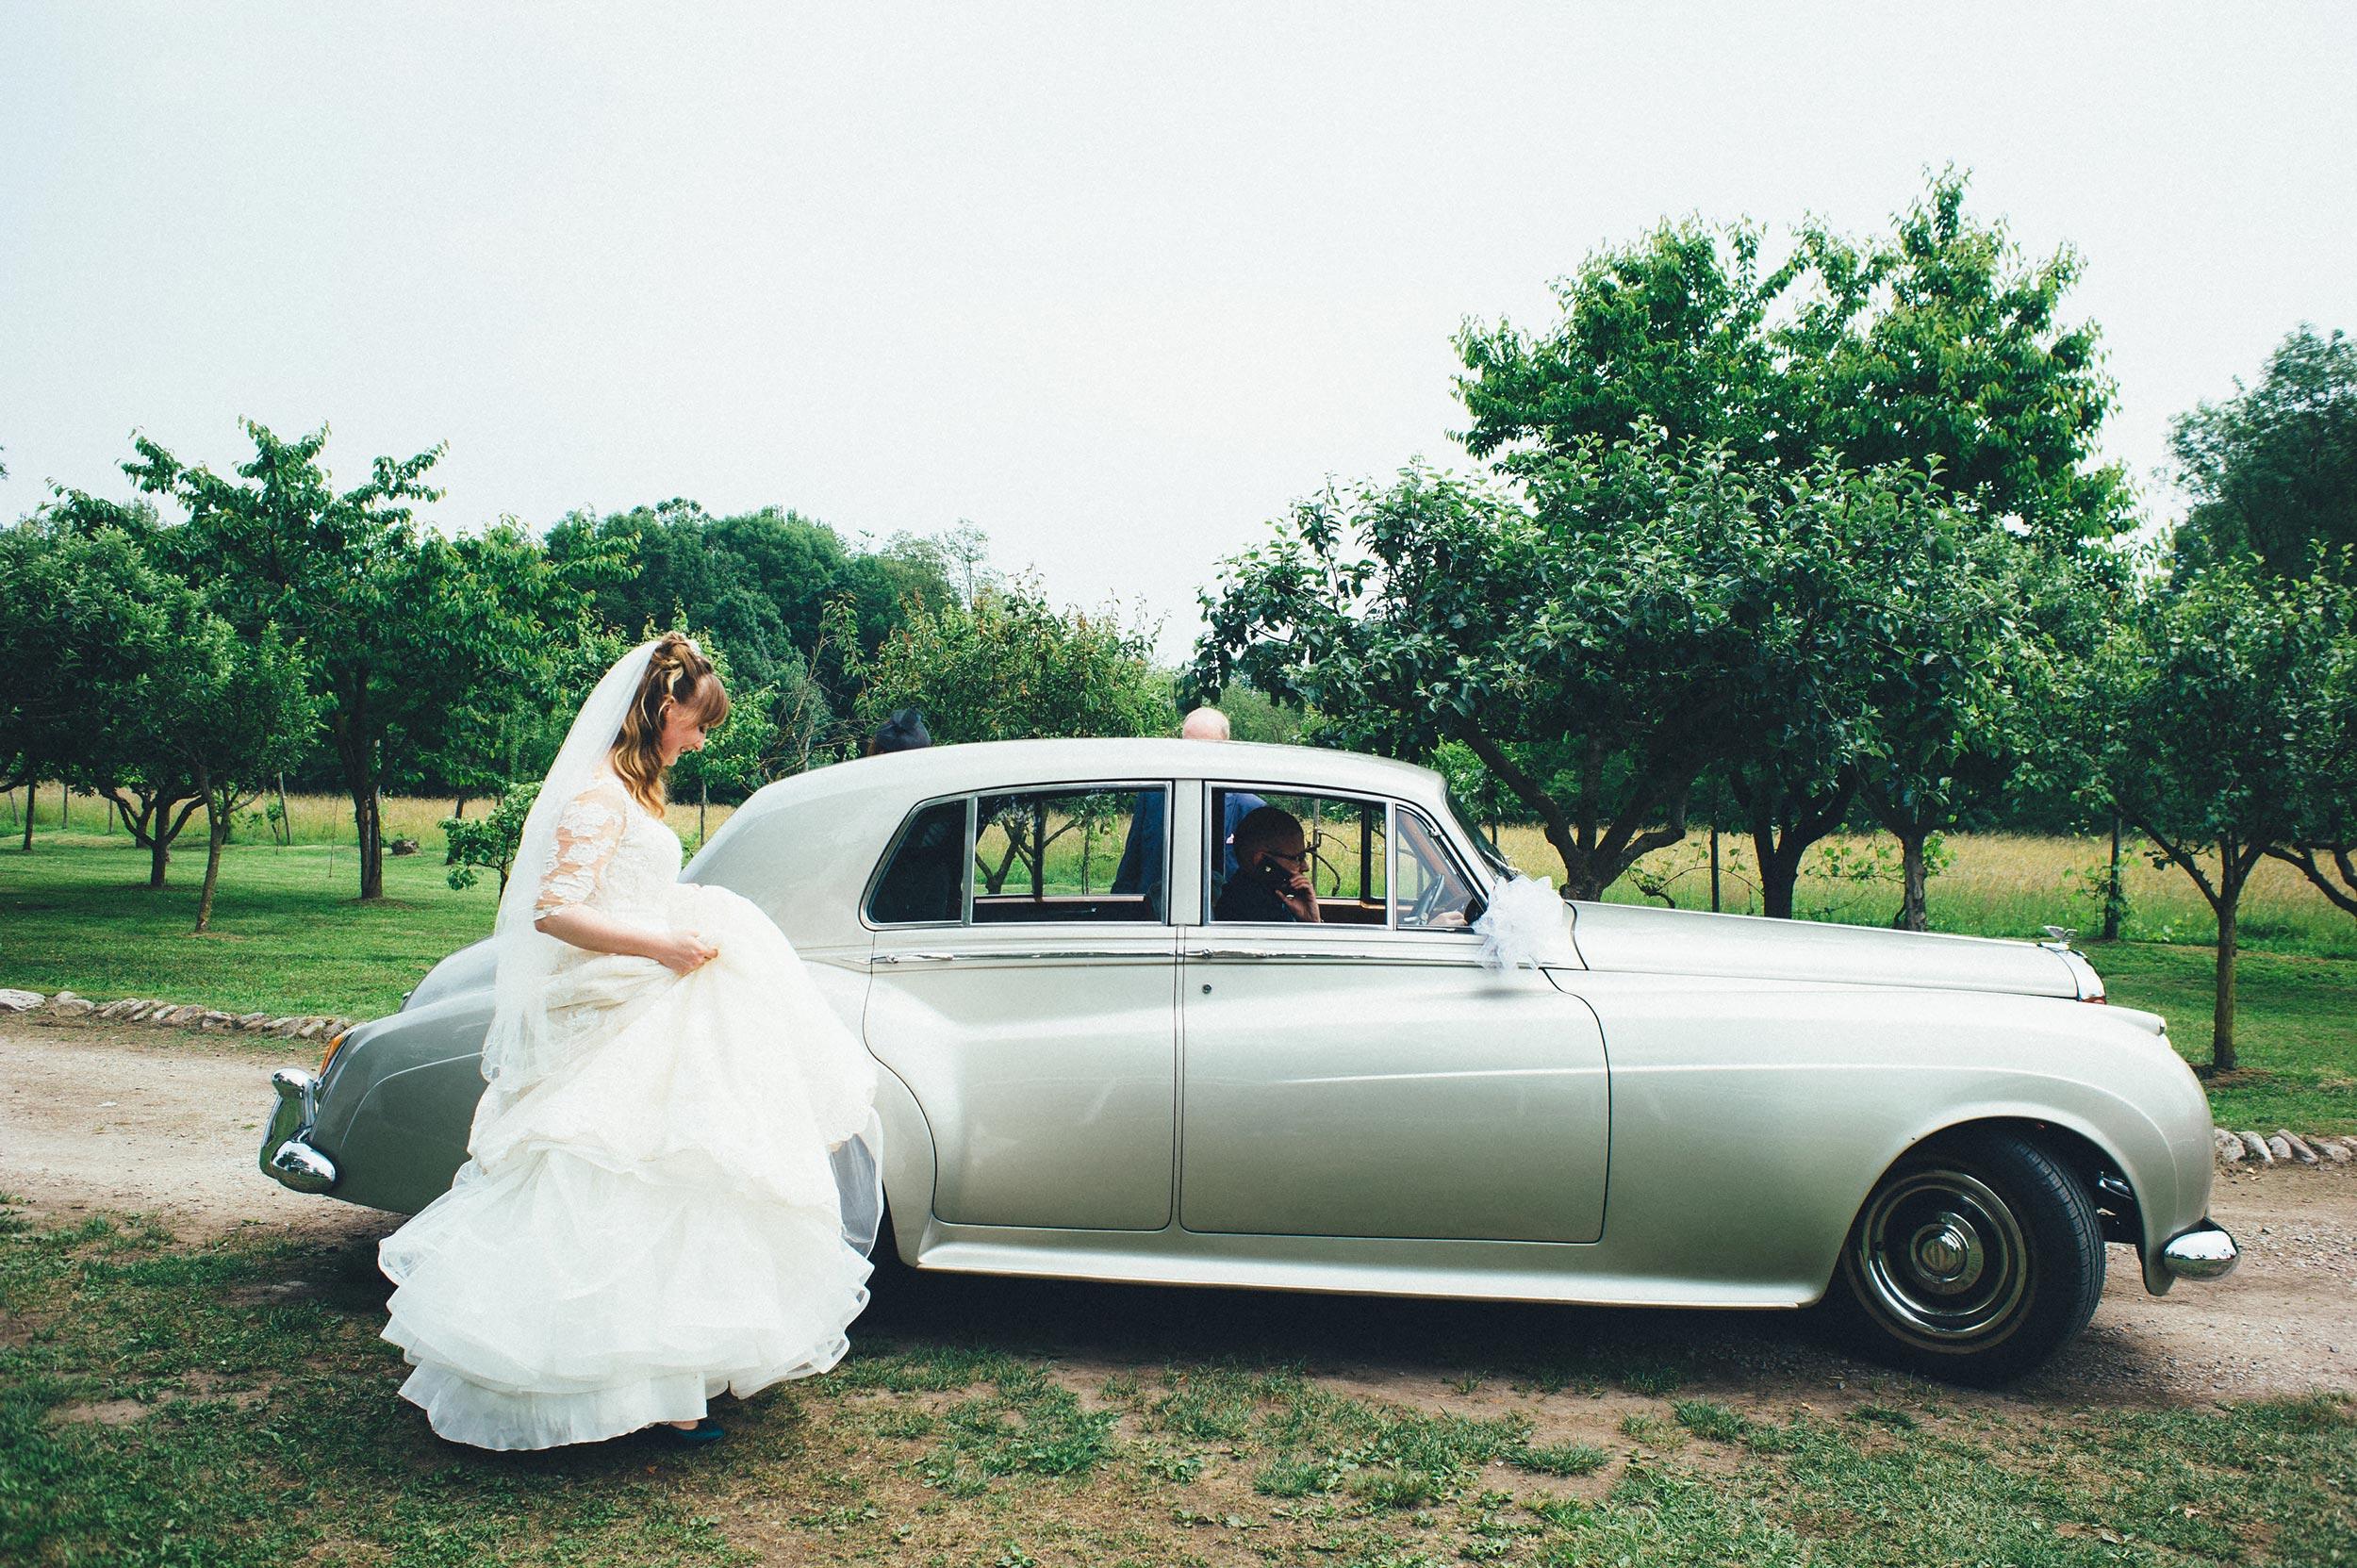 2016-Julius-Silke-Lake-Orta-Wedding-Photographer-Italy-Alessandro-Avenali-31.jpg